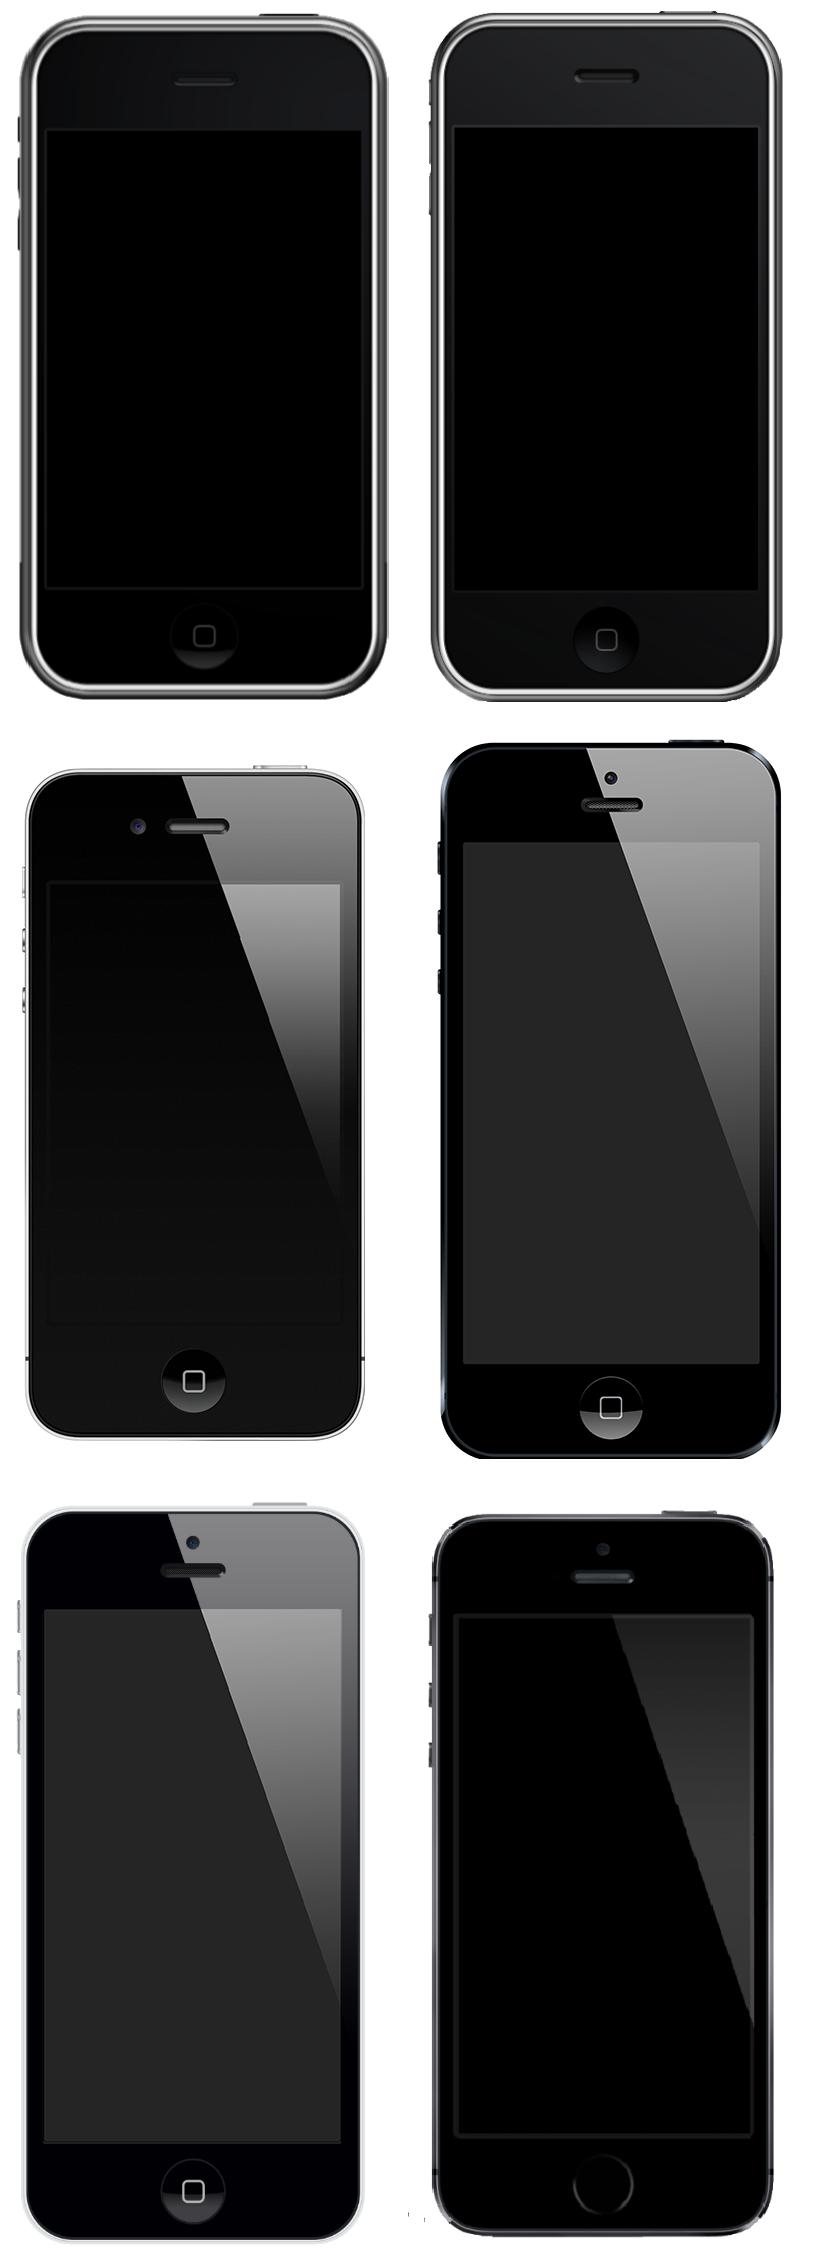 IPhone montage